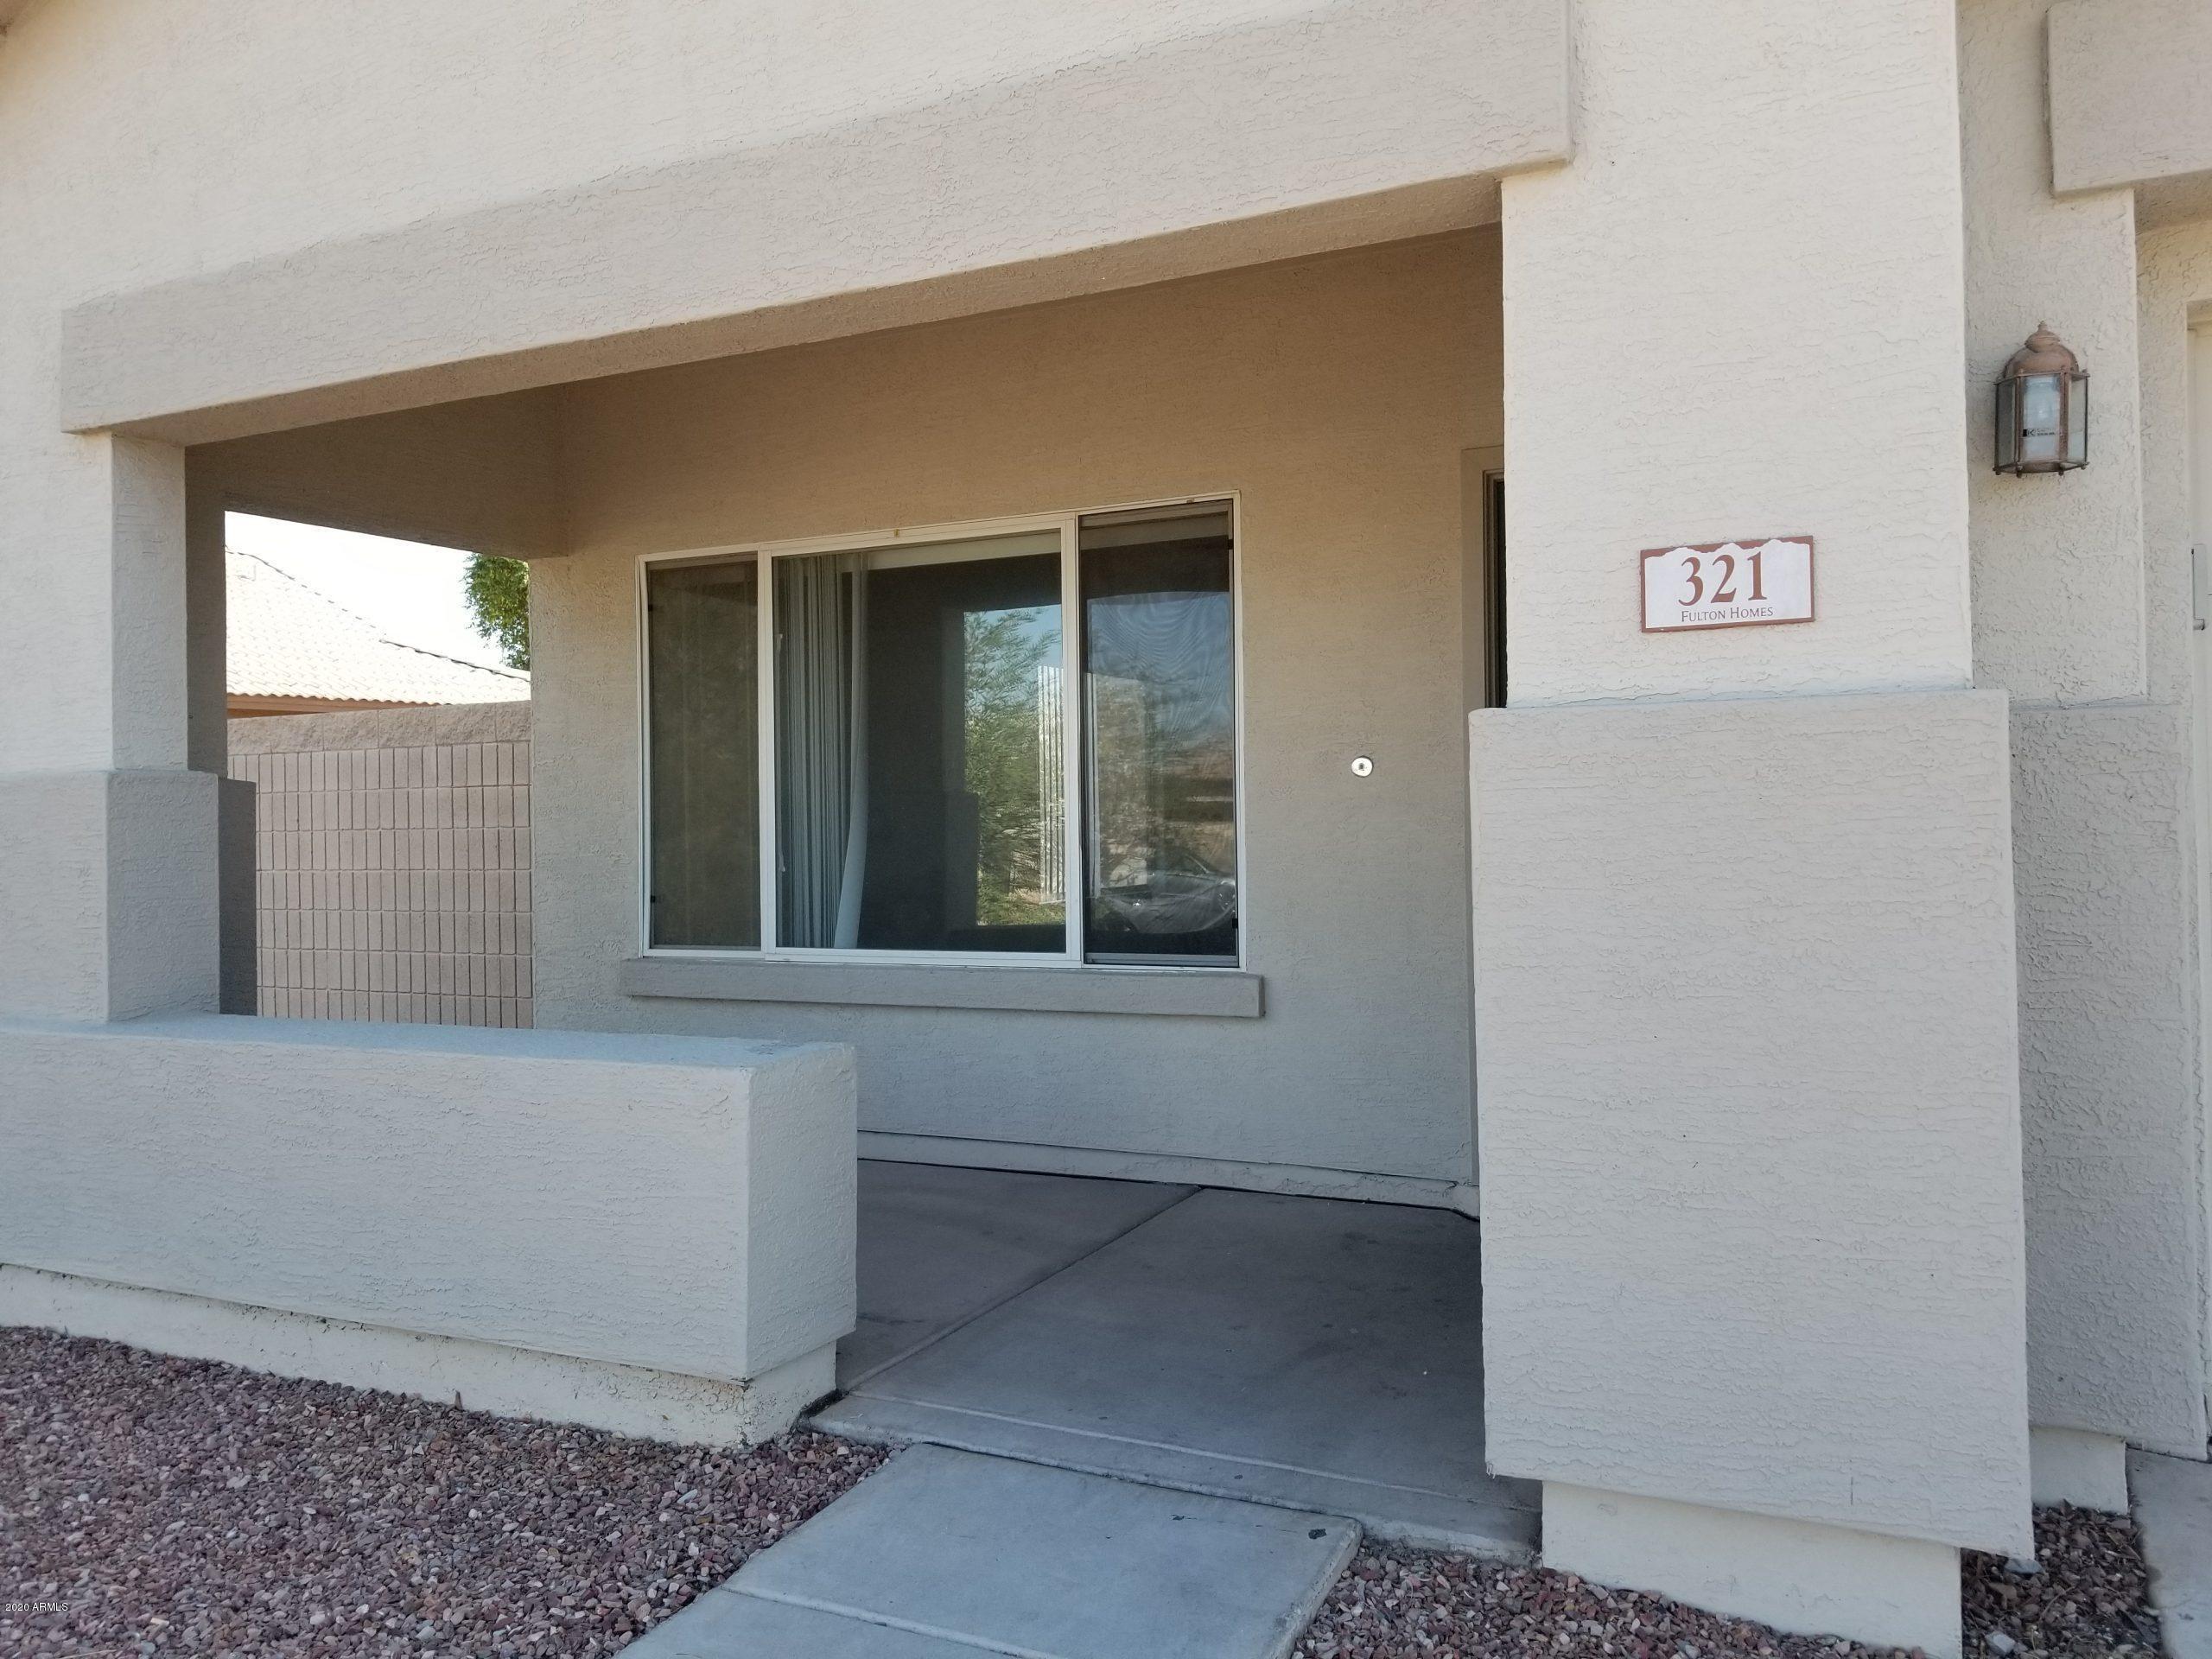 MLS 6147200 321 S 120TH Avenue, Avondale, AZ 85323 Avondale AZ RV Park